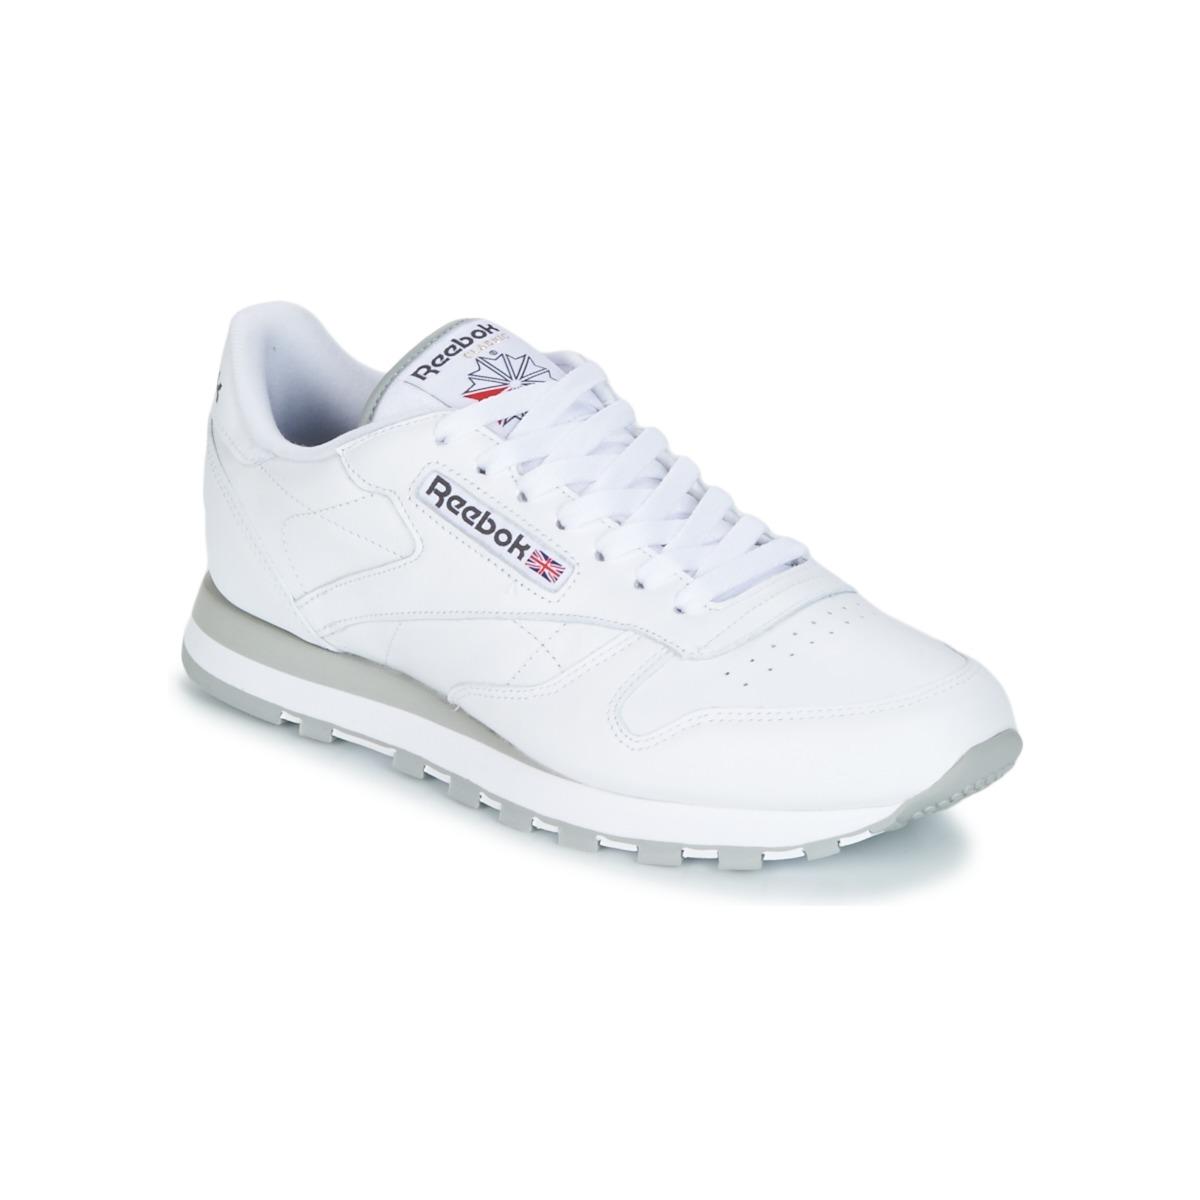 saludo Oxidar pueblo  50%OFF Reebok Classic CLASSIC LEATHER WHITE LIGHT GREY Shoes Low ...